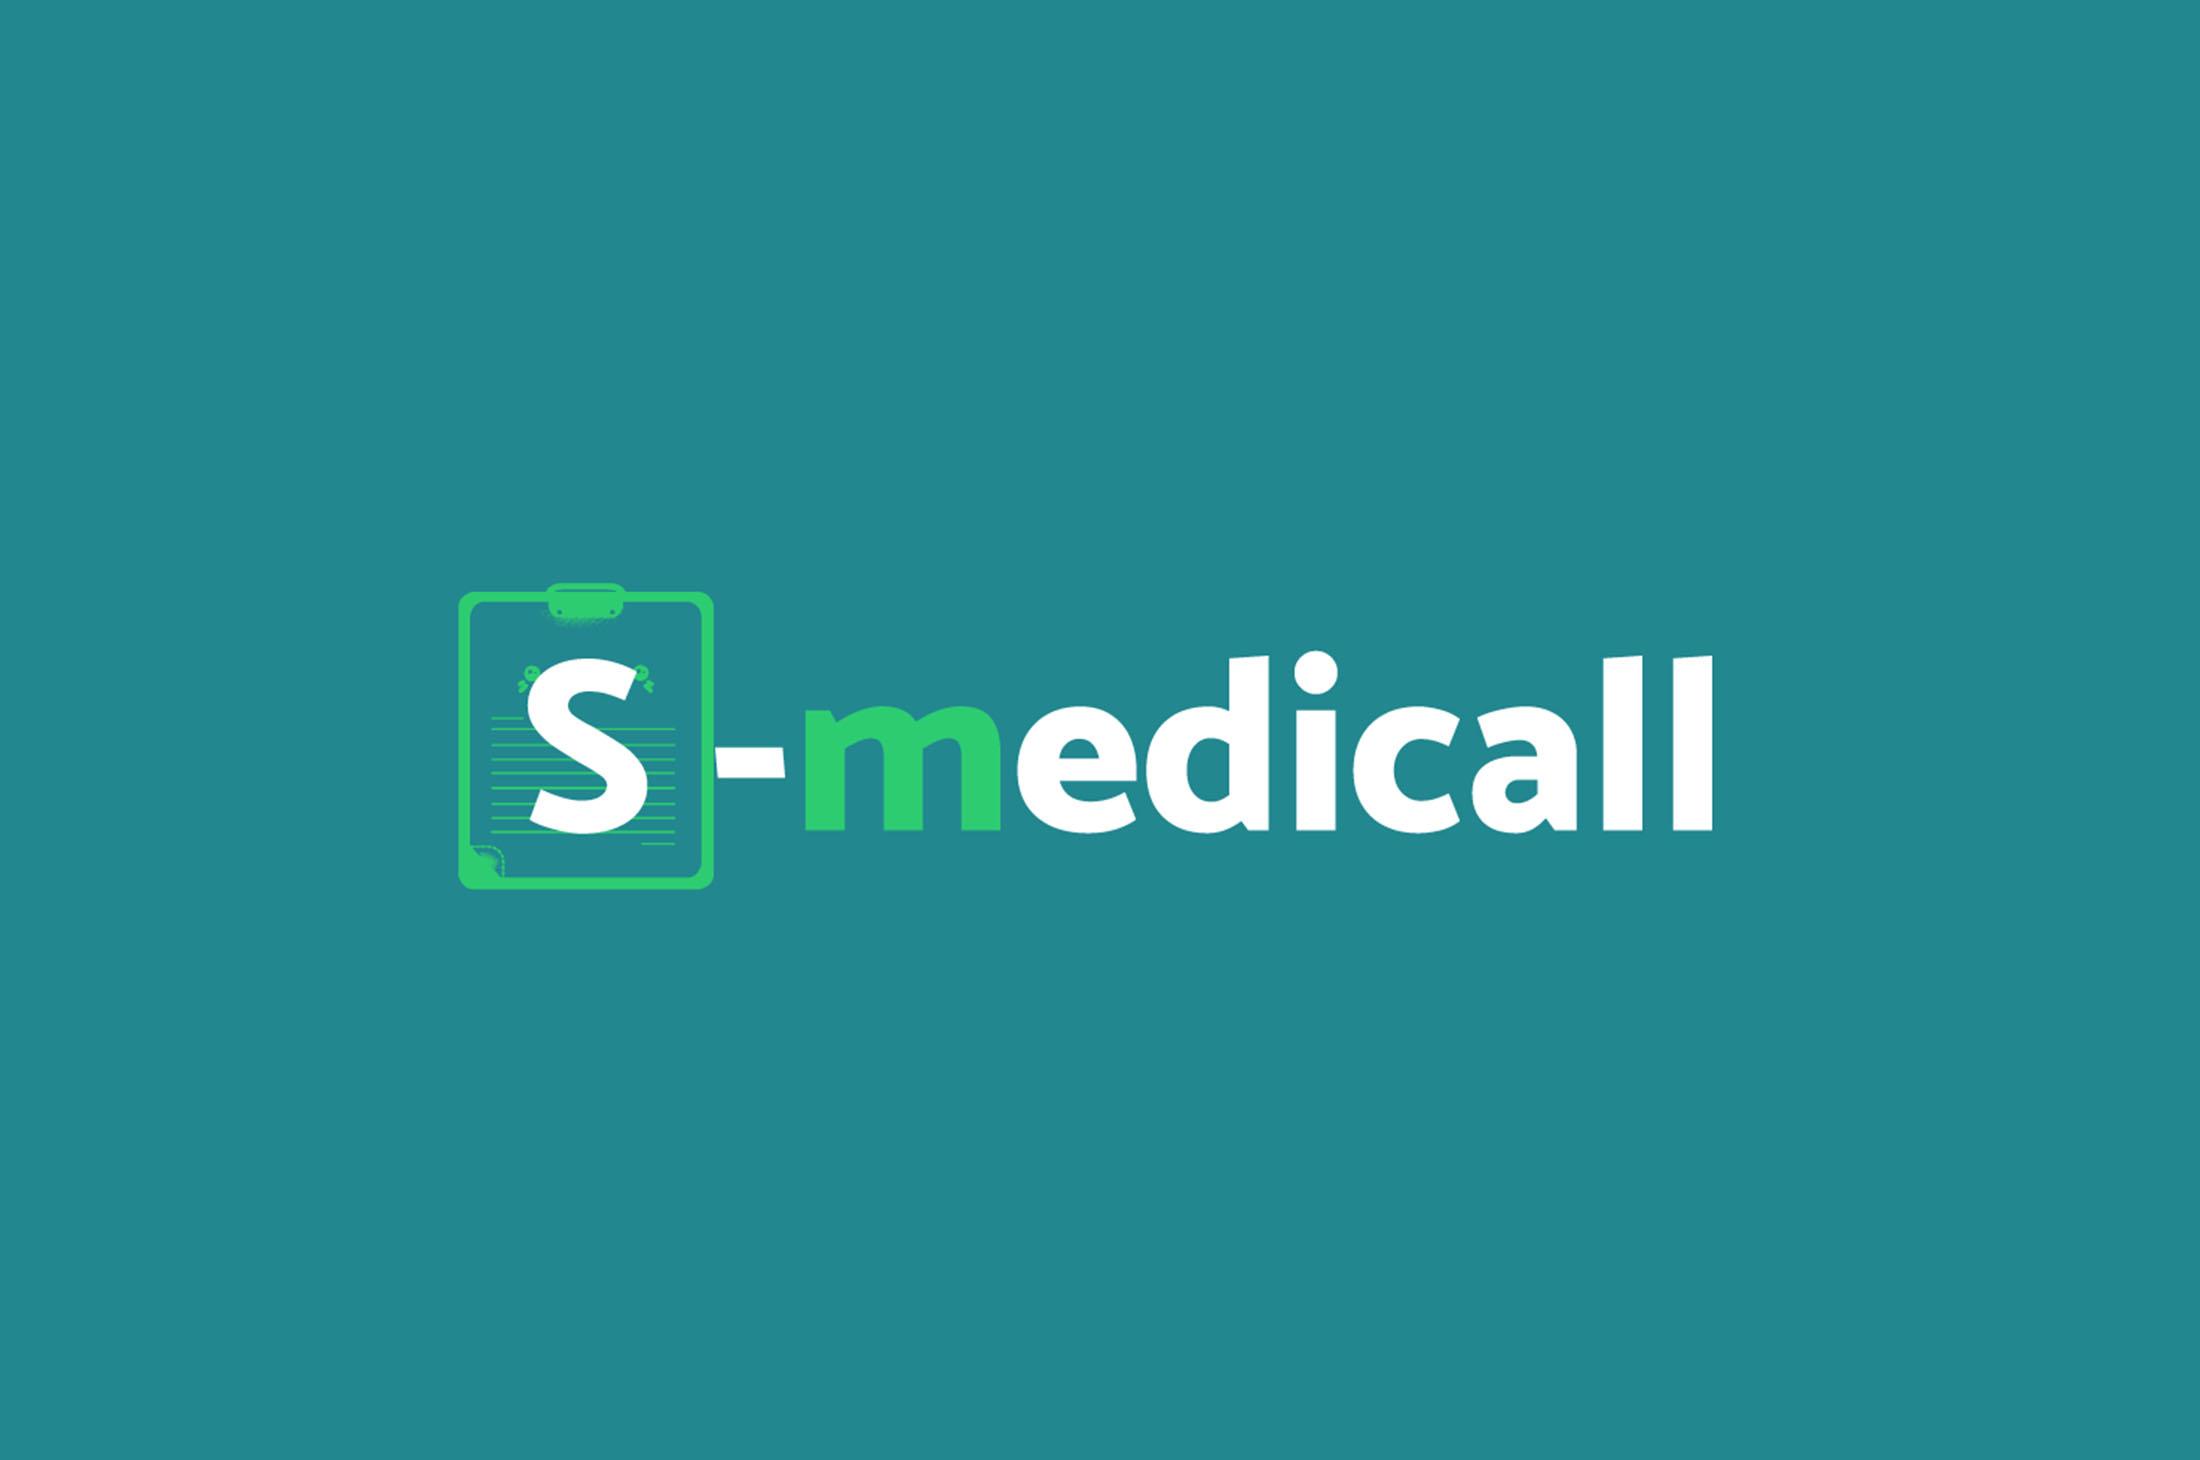 S-medicall 2